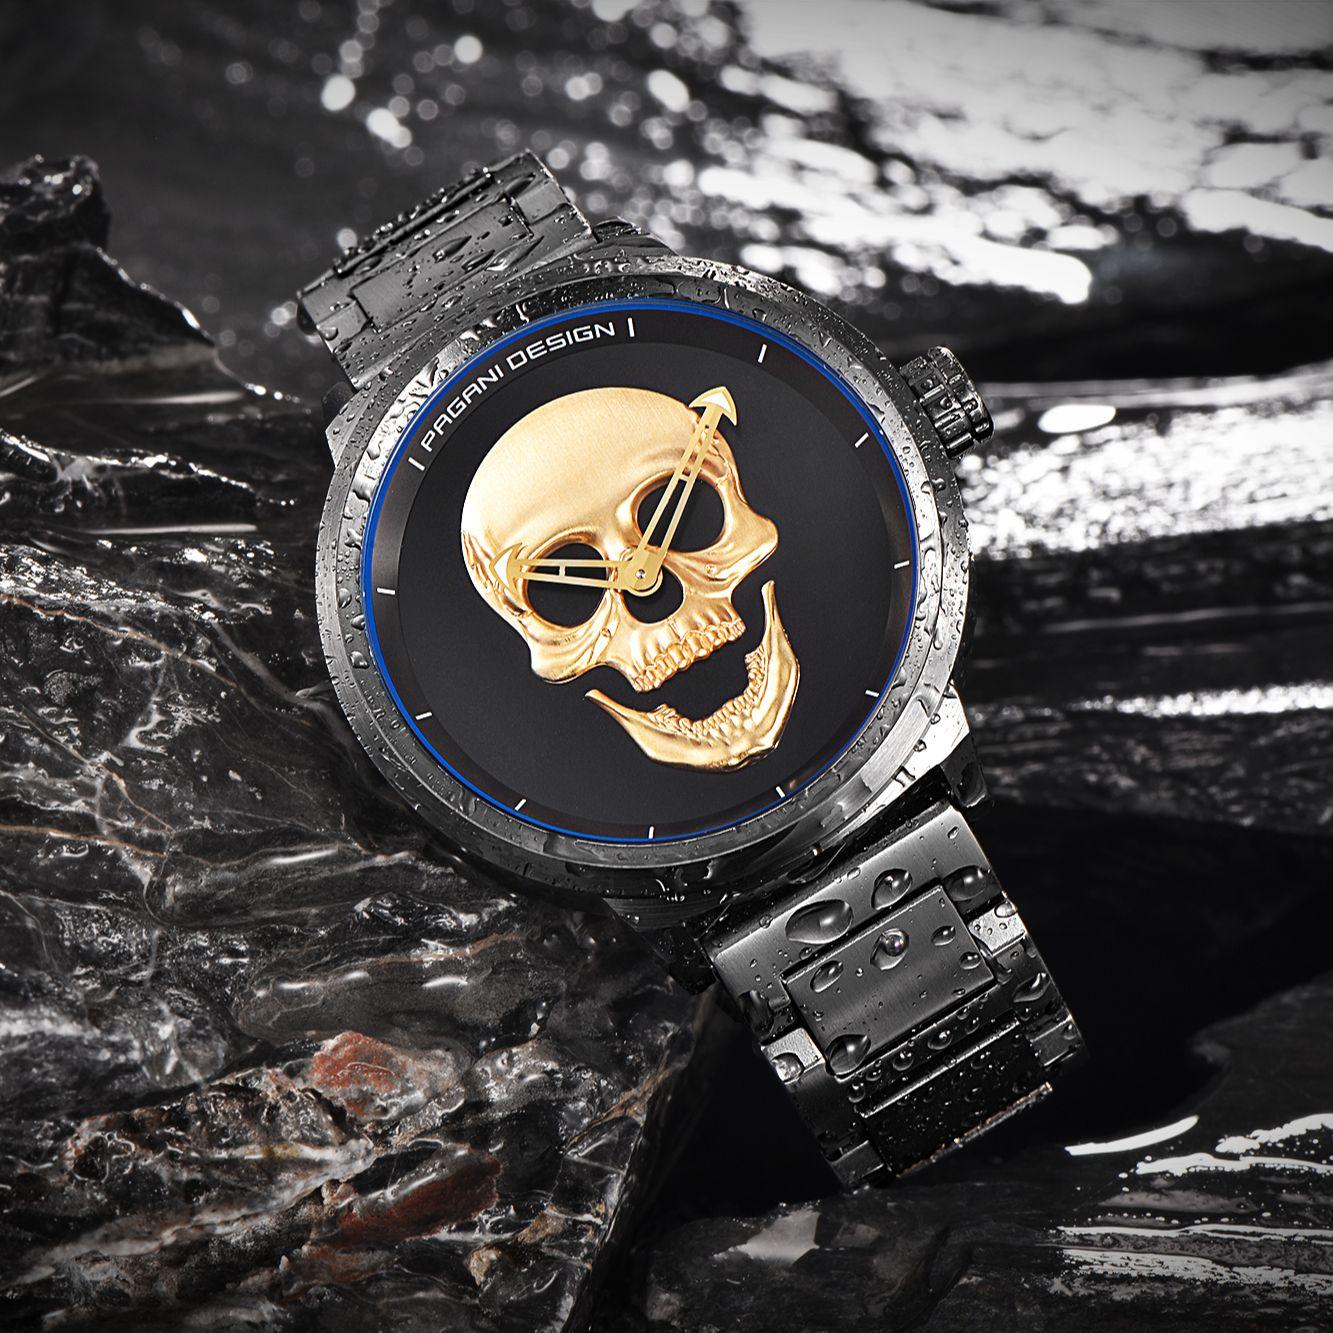 2021 Pagani Design Top Brand 3D Skeleton Personality Retro Fashion Watch Men's Luxury Large Dial Design Waterproof Quartz Watch enlarge